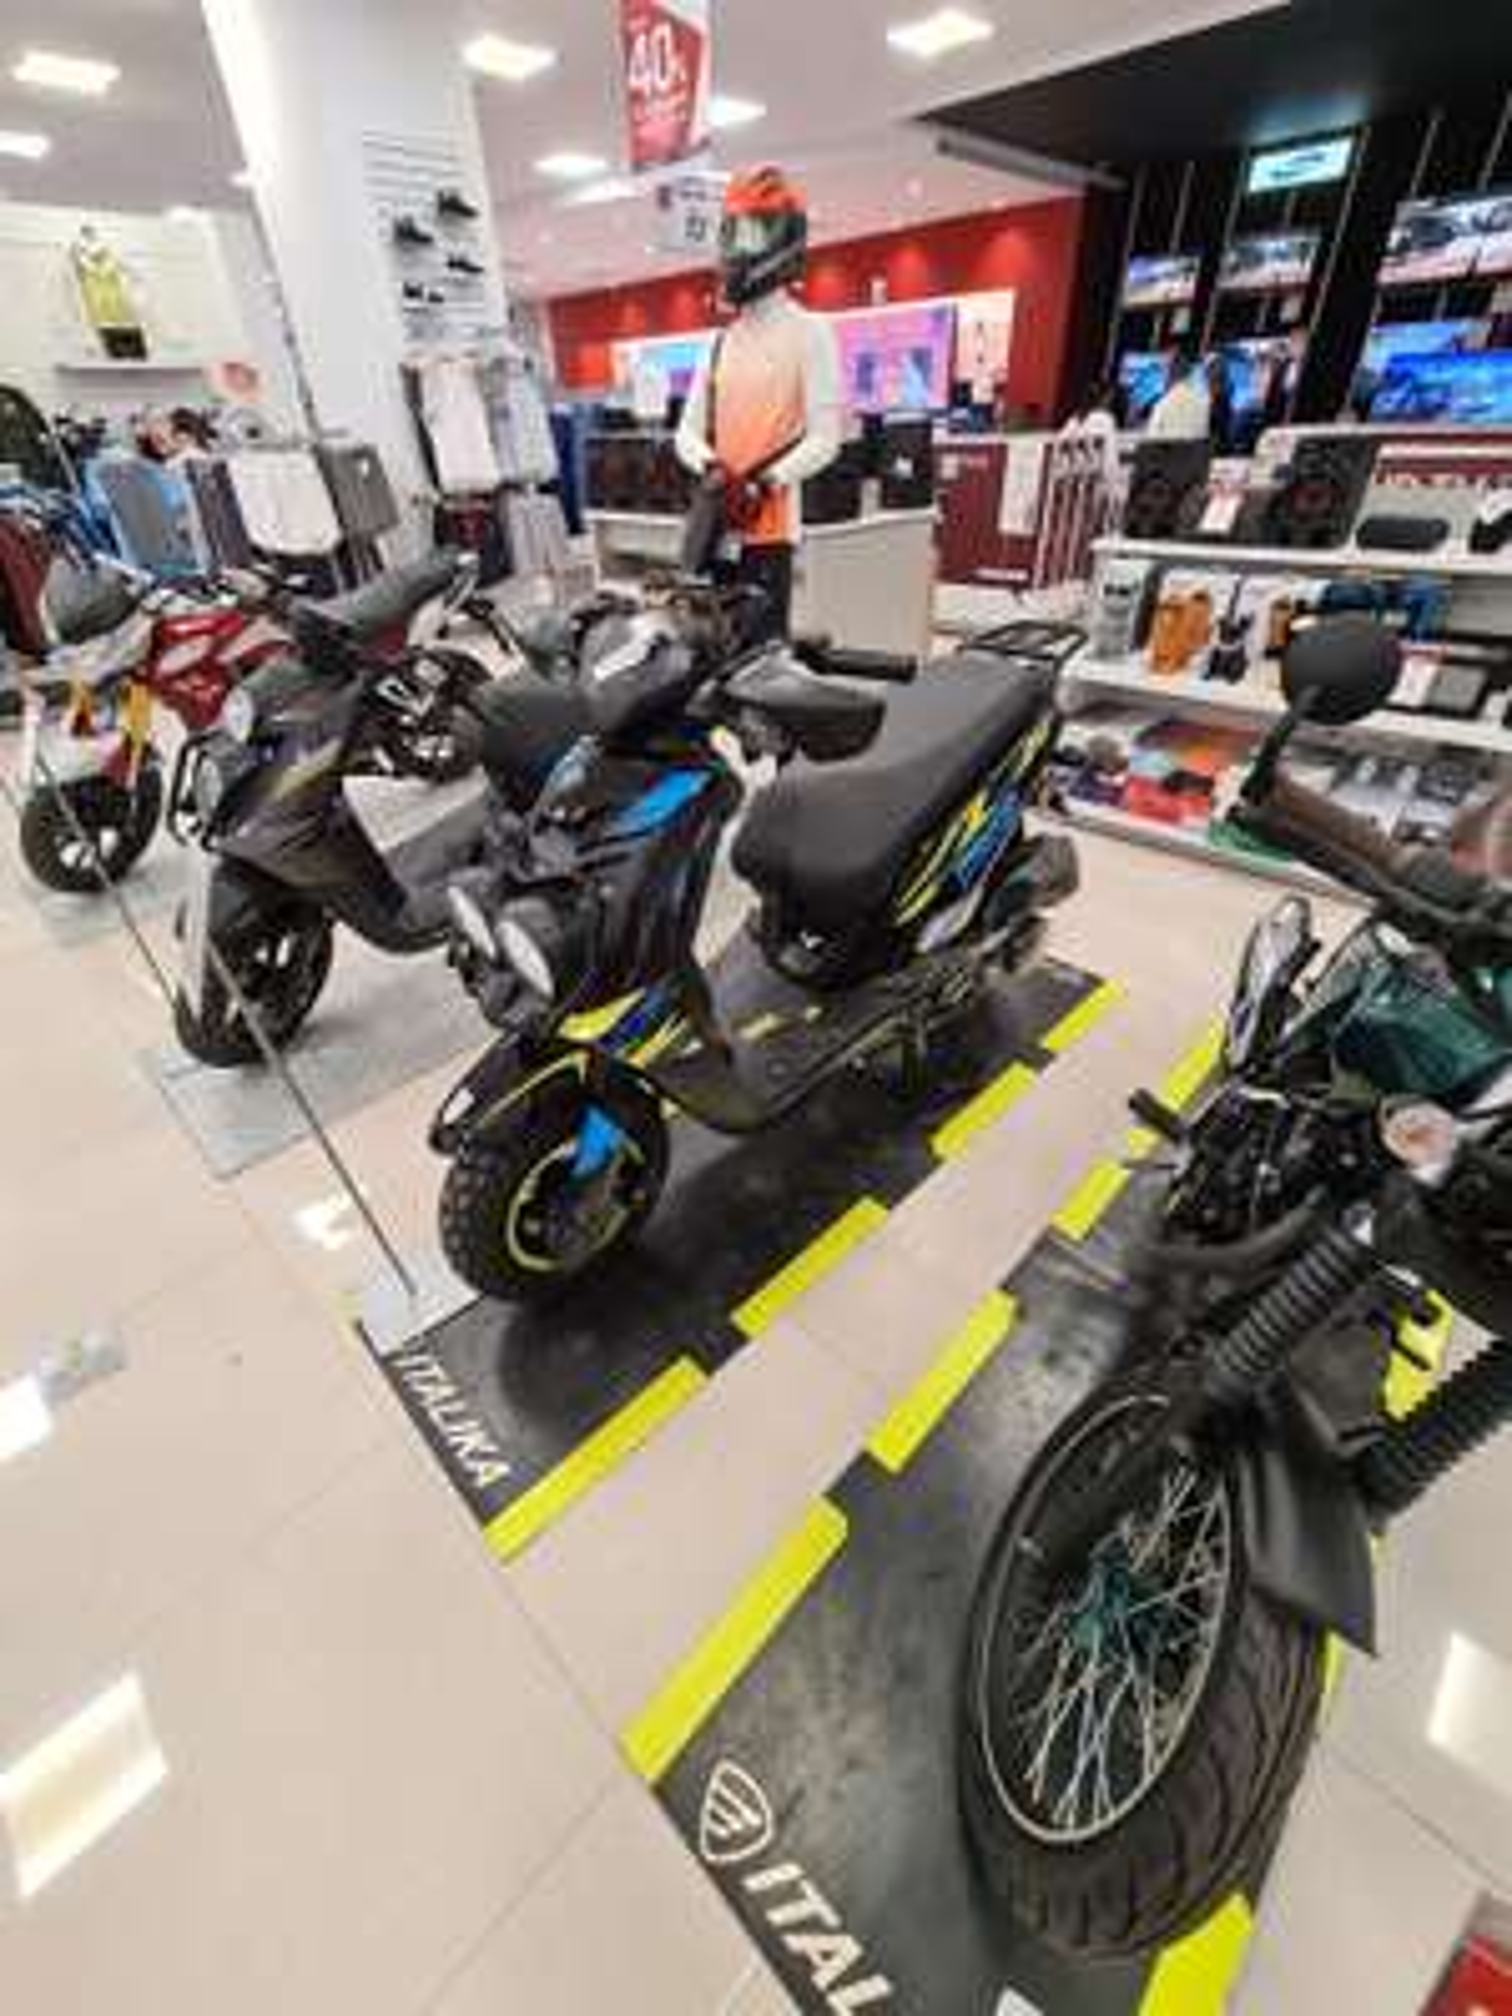 Suburbia tuxtepec Motoneta italika WS 175 Sport 2021 con Scooter de regalo